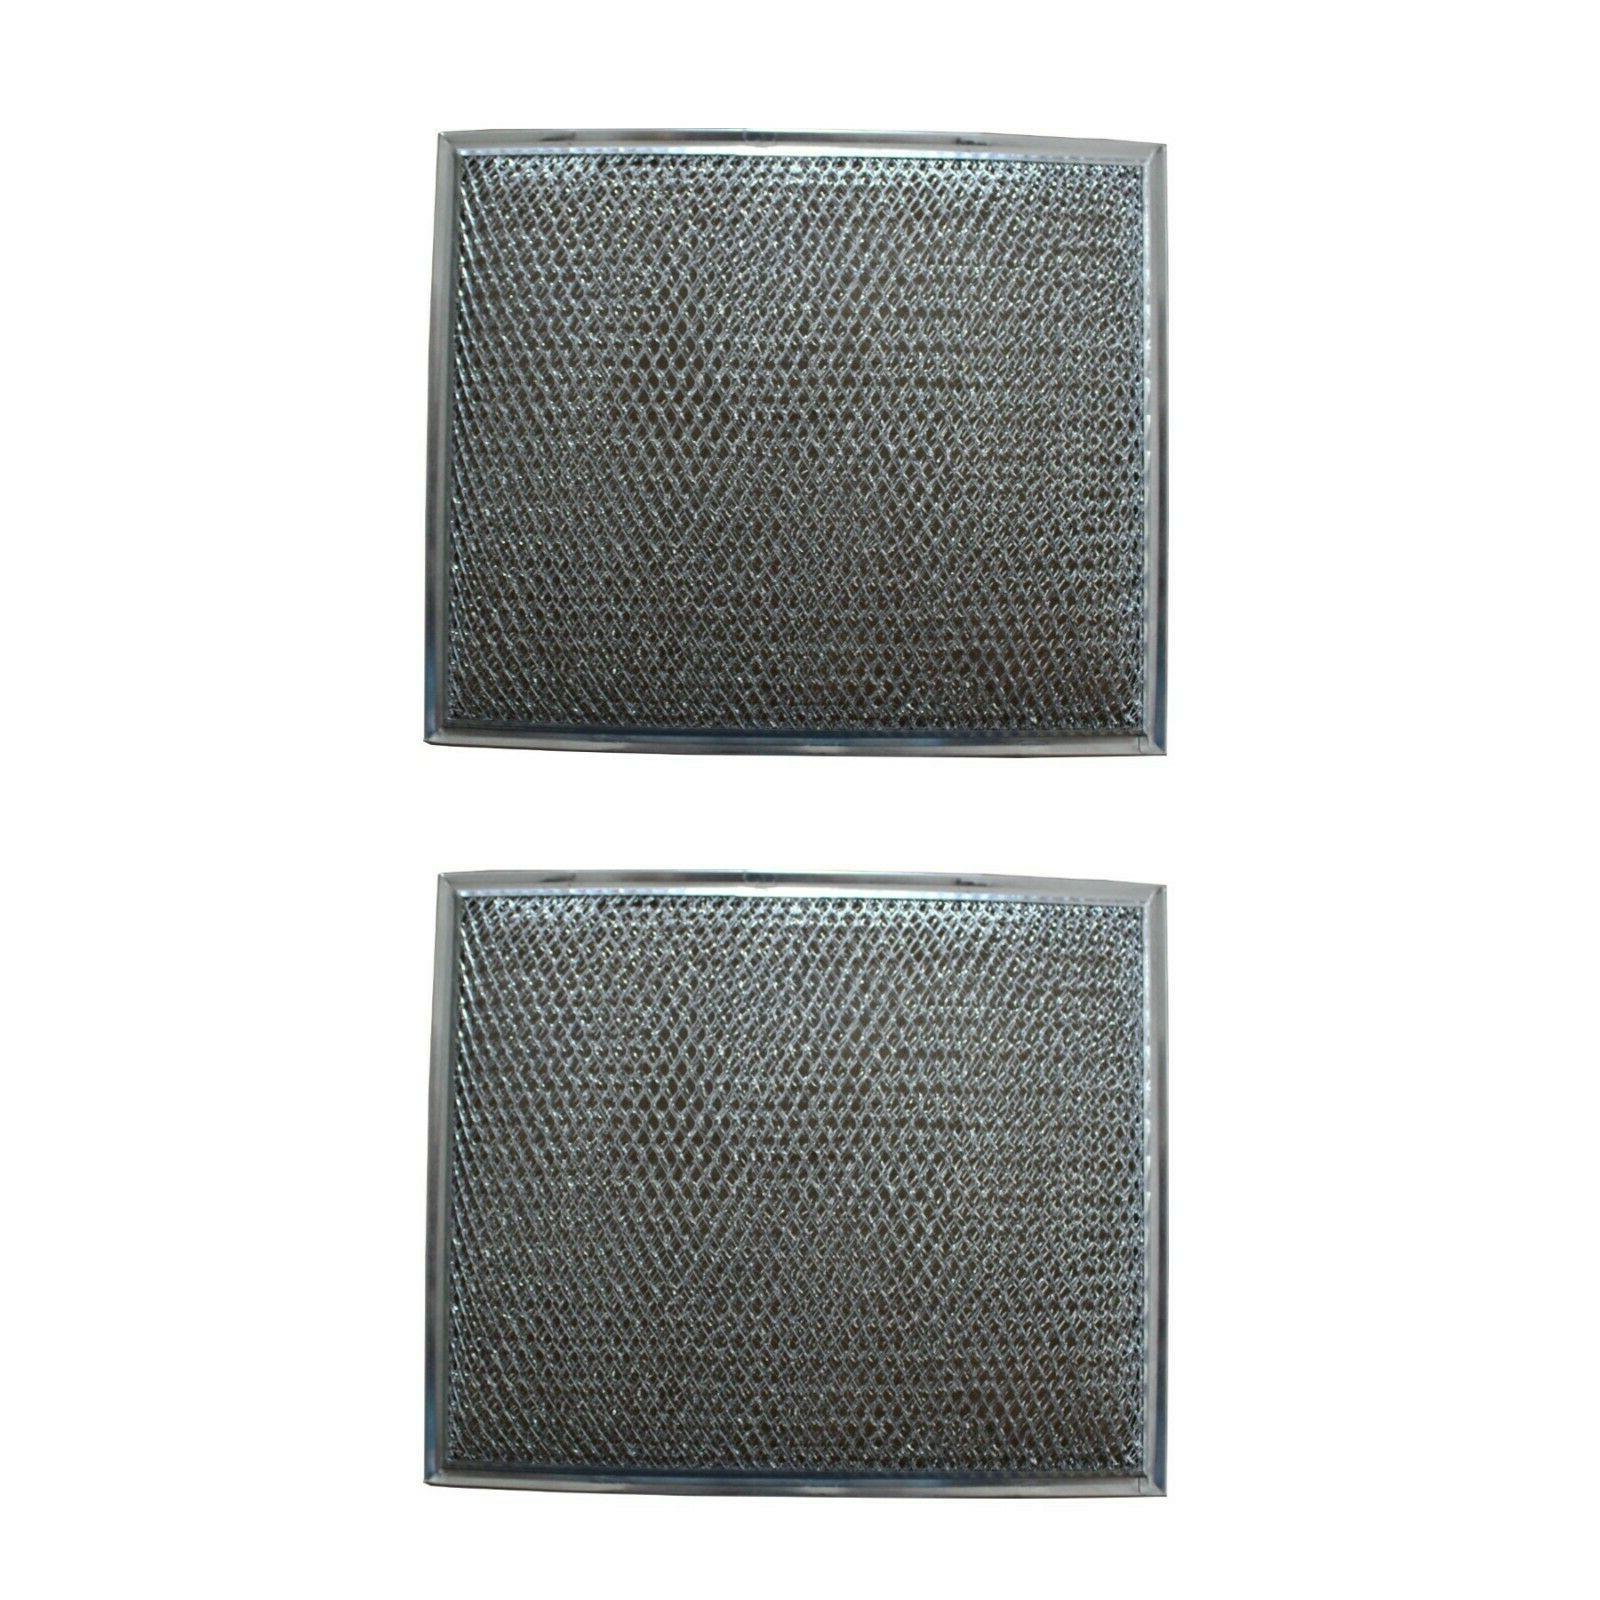 aluminum range hood grease mesh filter replacement